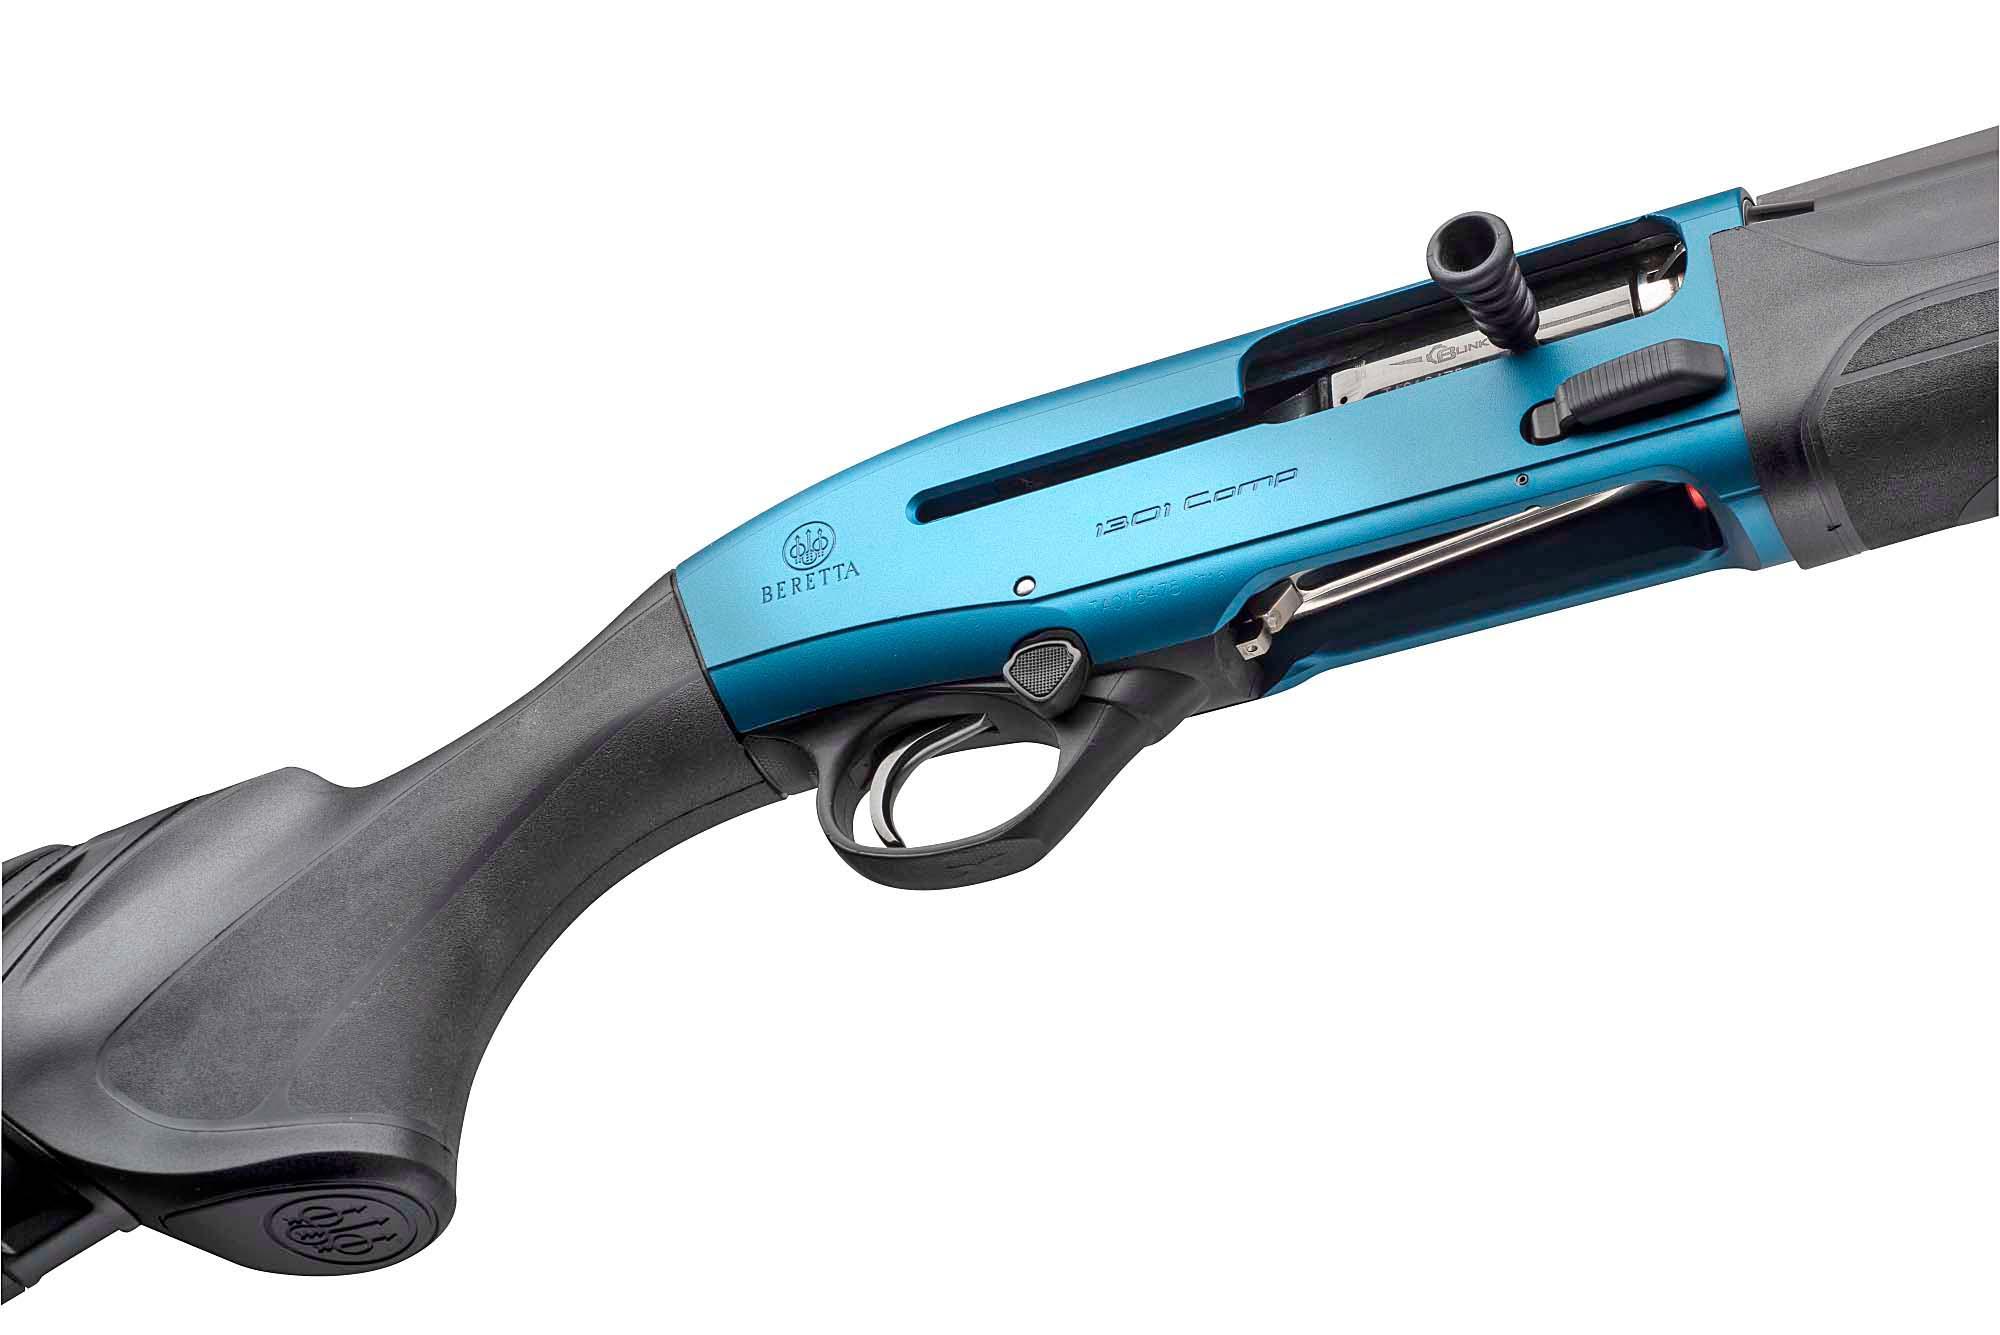 Beretta 1301 Comp Pro 12Ga shotgun | GUNSweek com